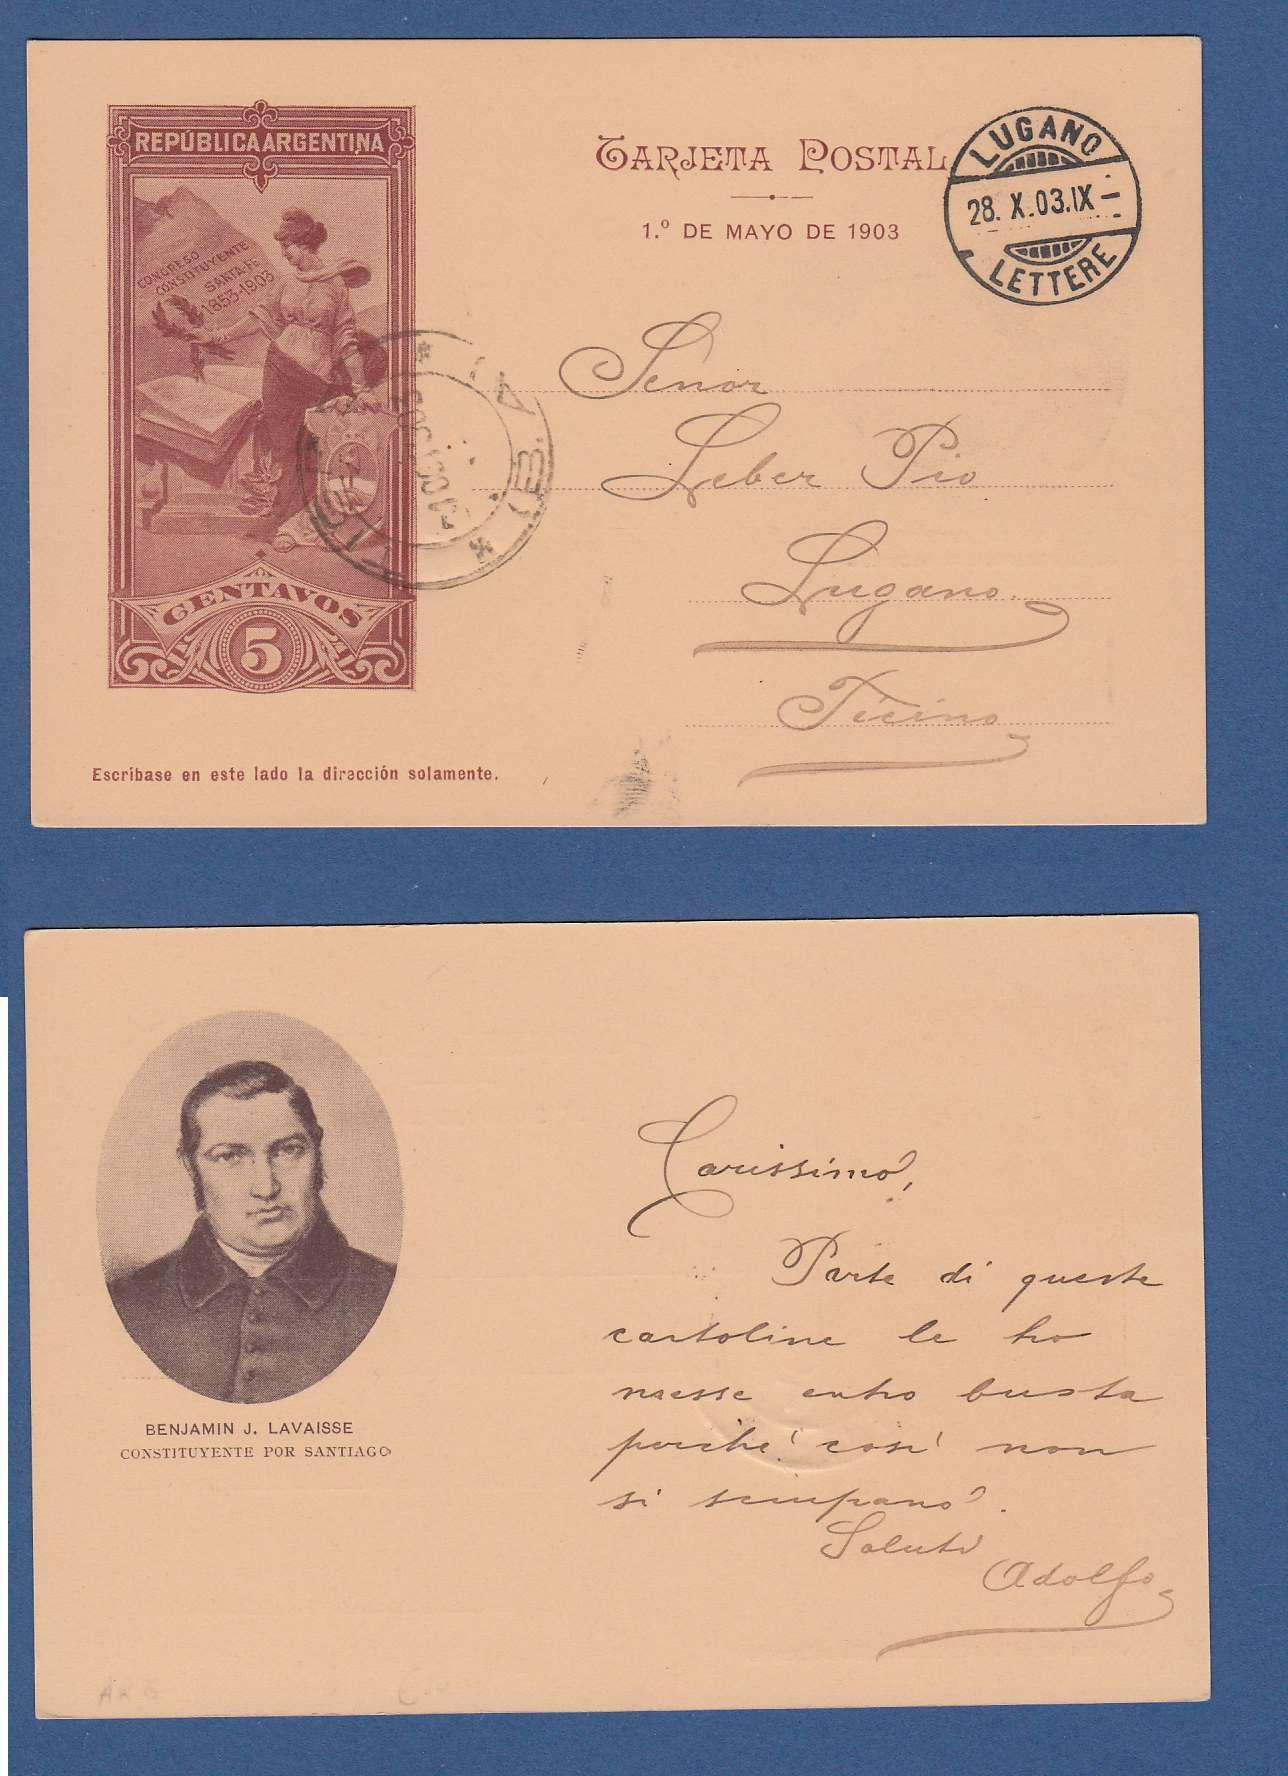 ARGENTINA ill postal card Lavaisse1903 Tigre to Switzerland ARG 037